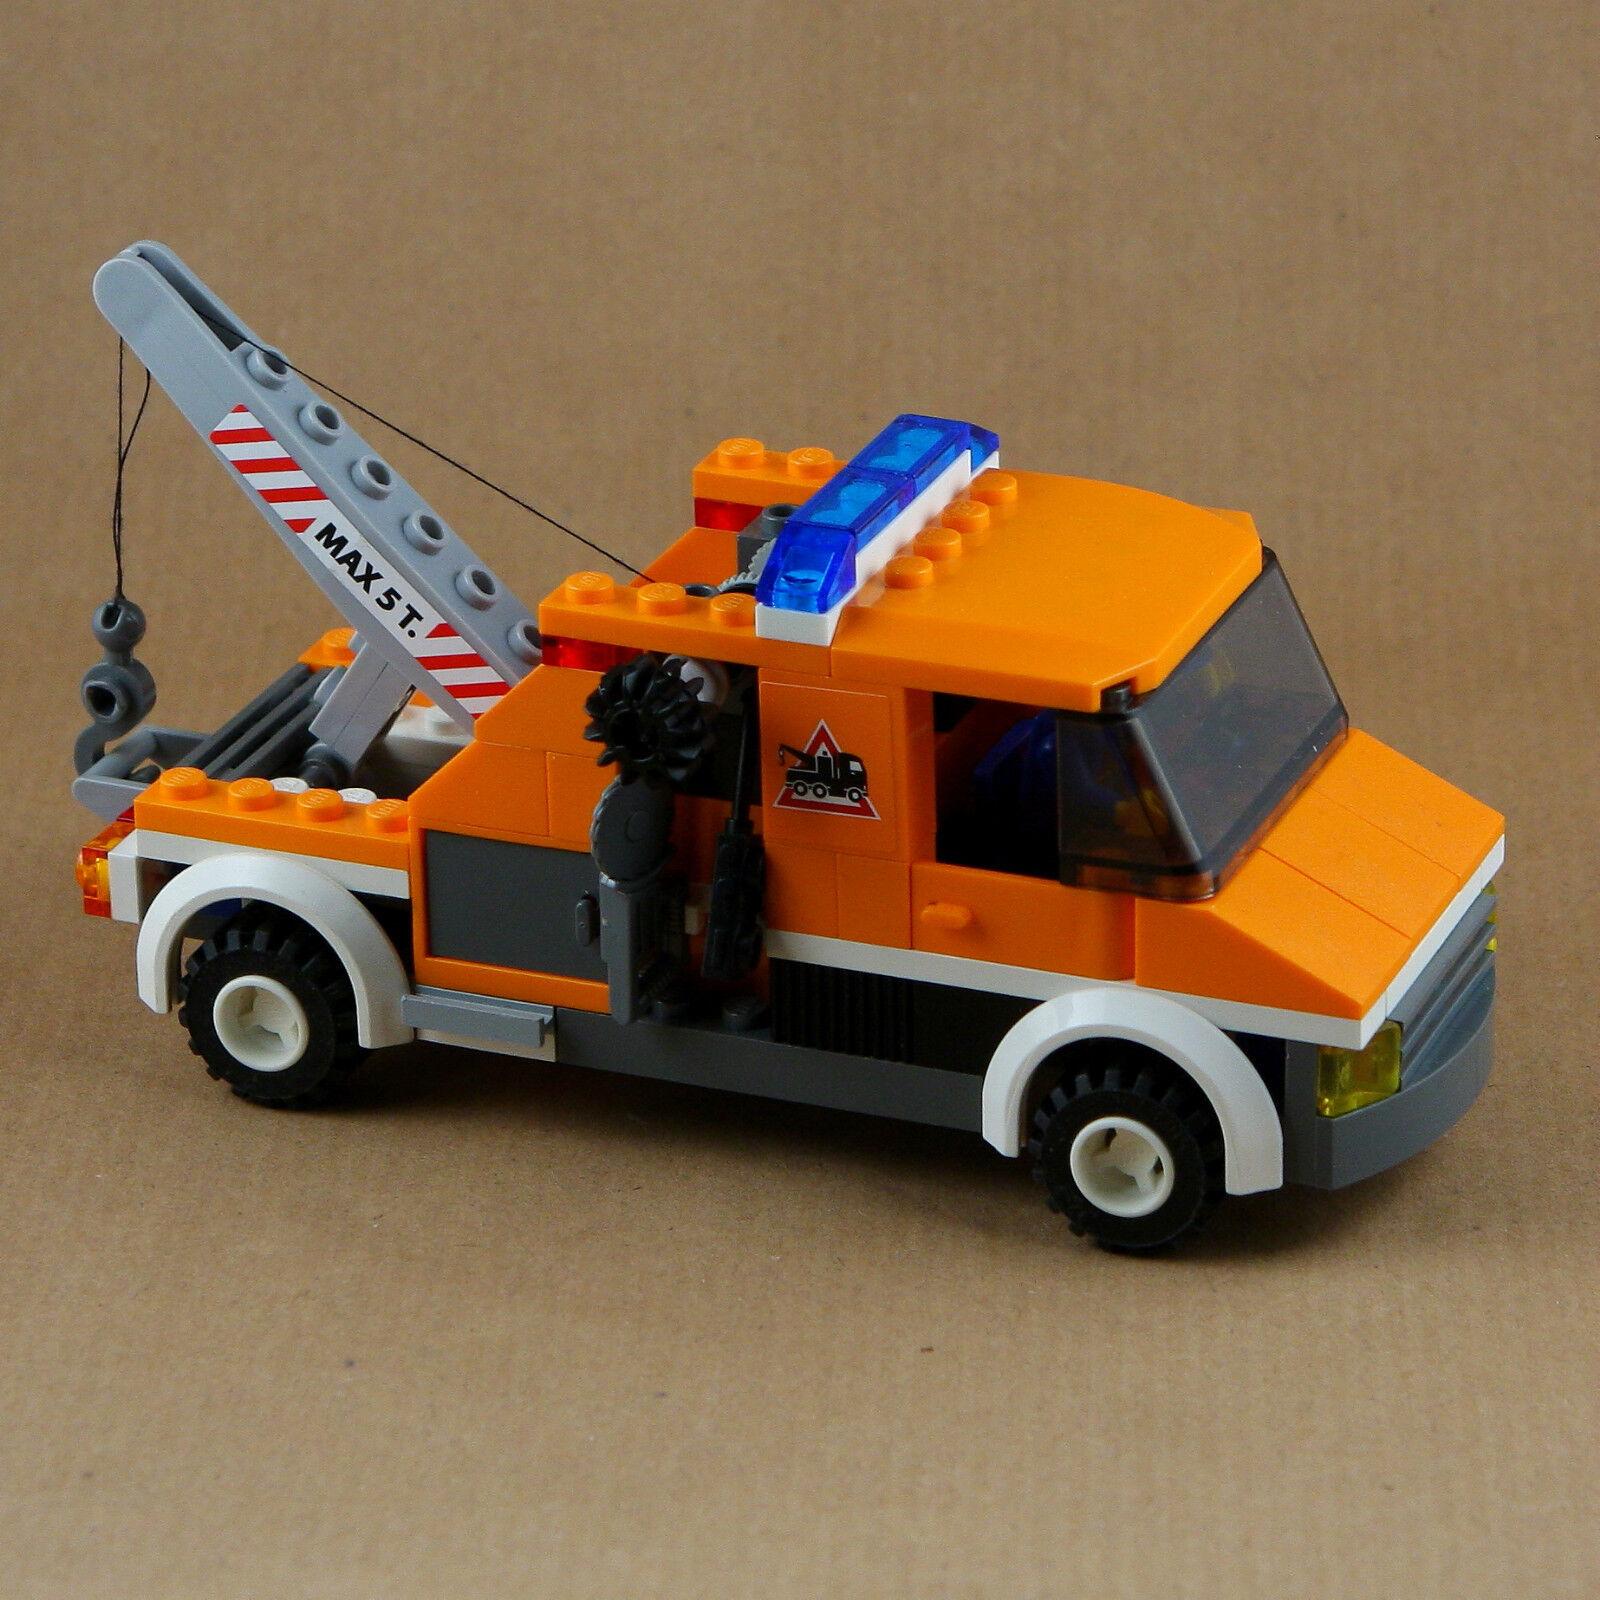 Lego City Traffic Tow Truck 7638